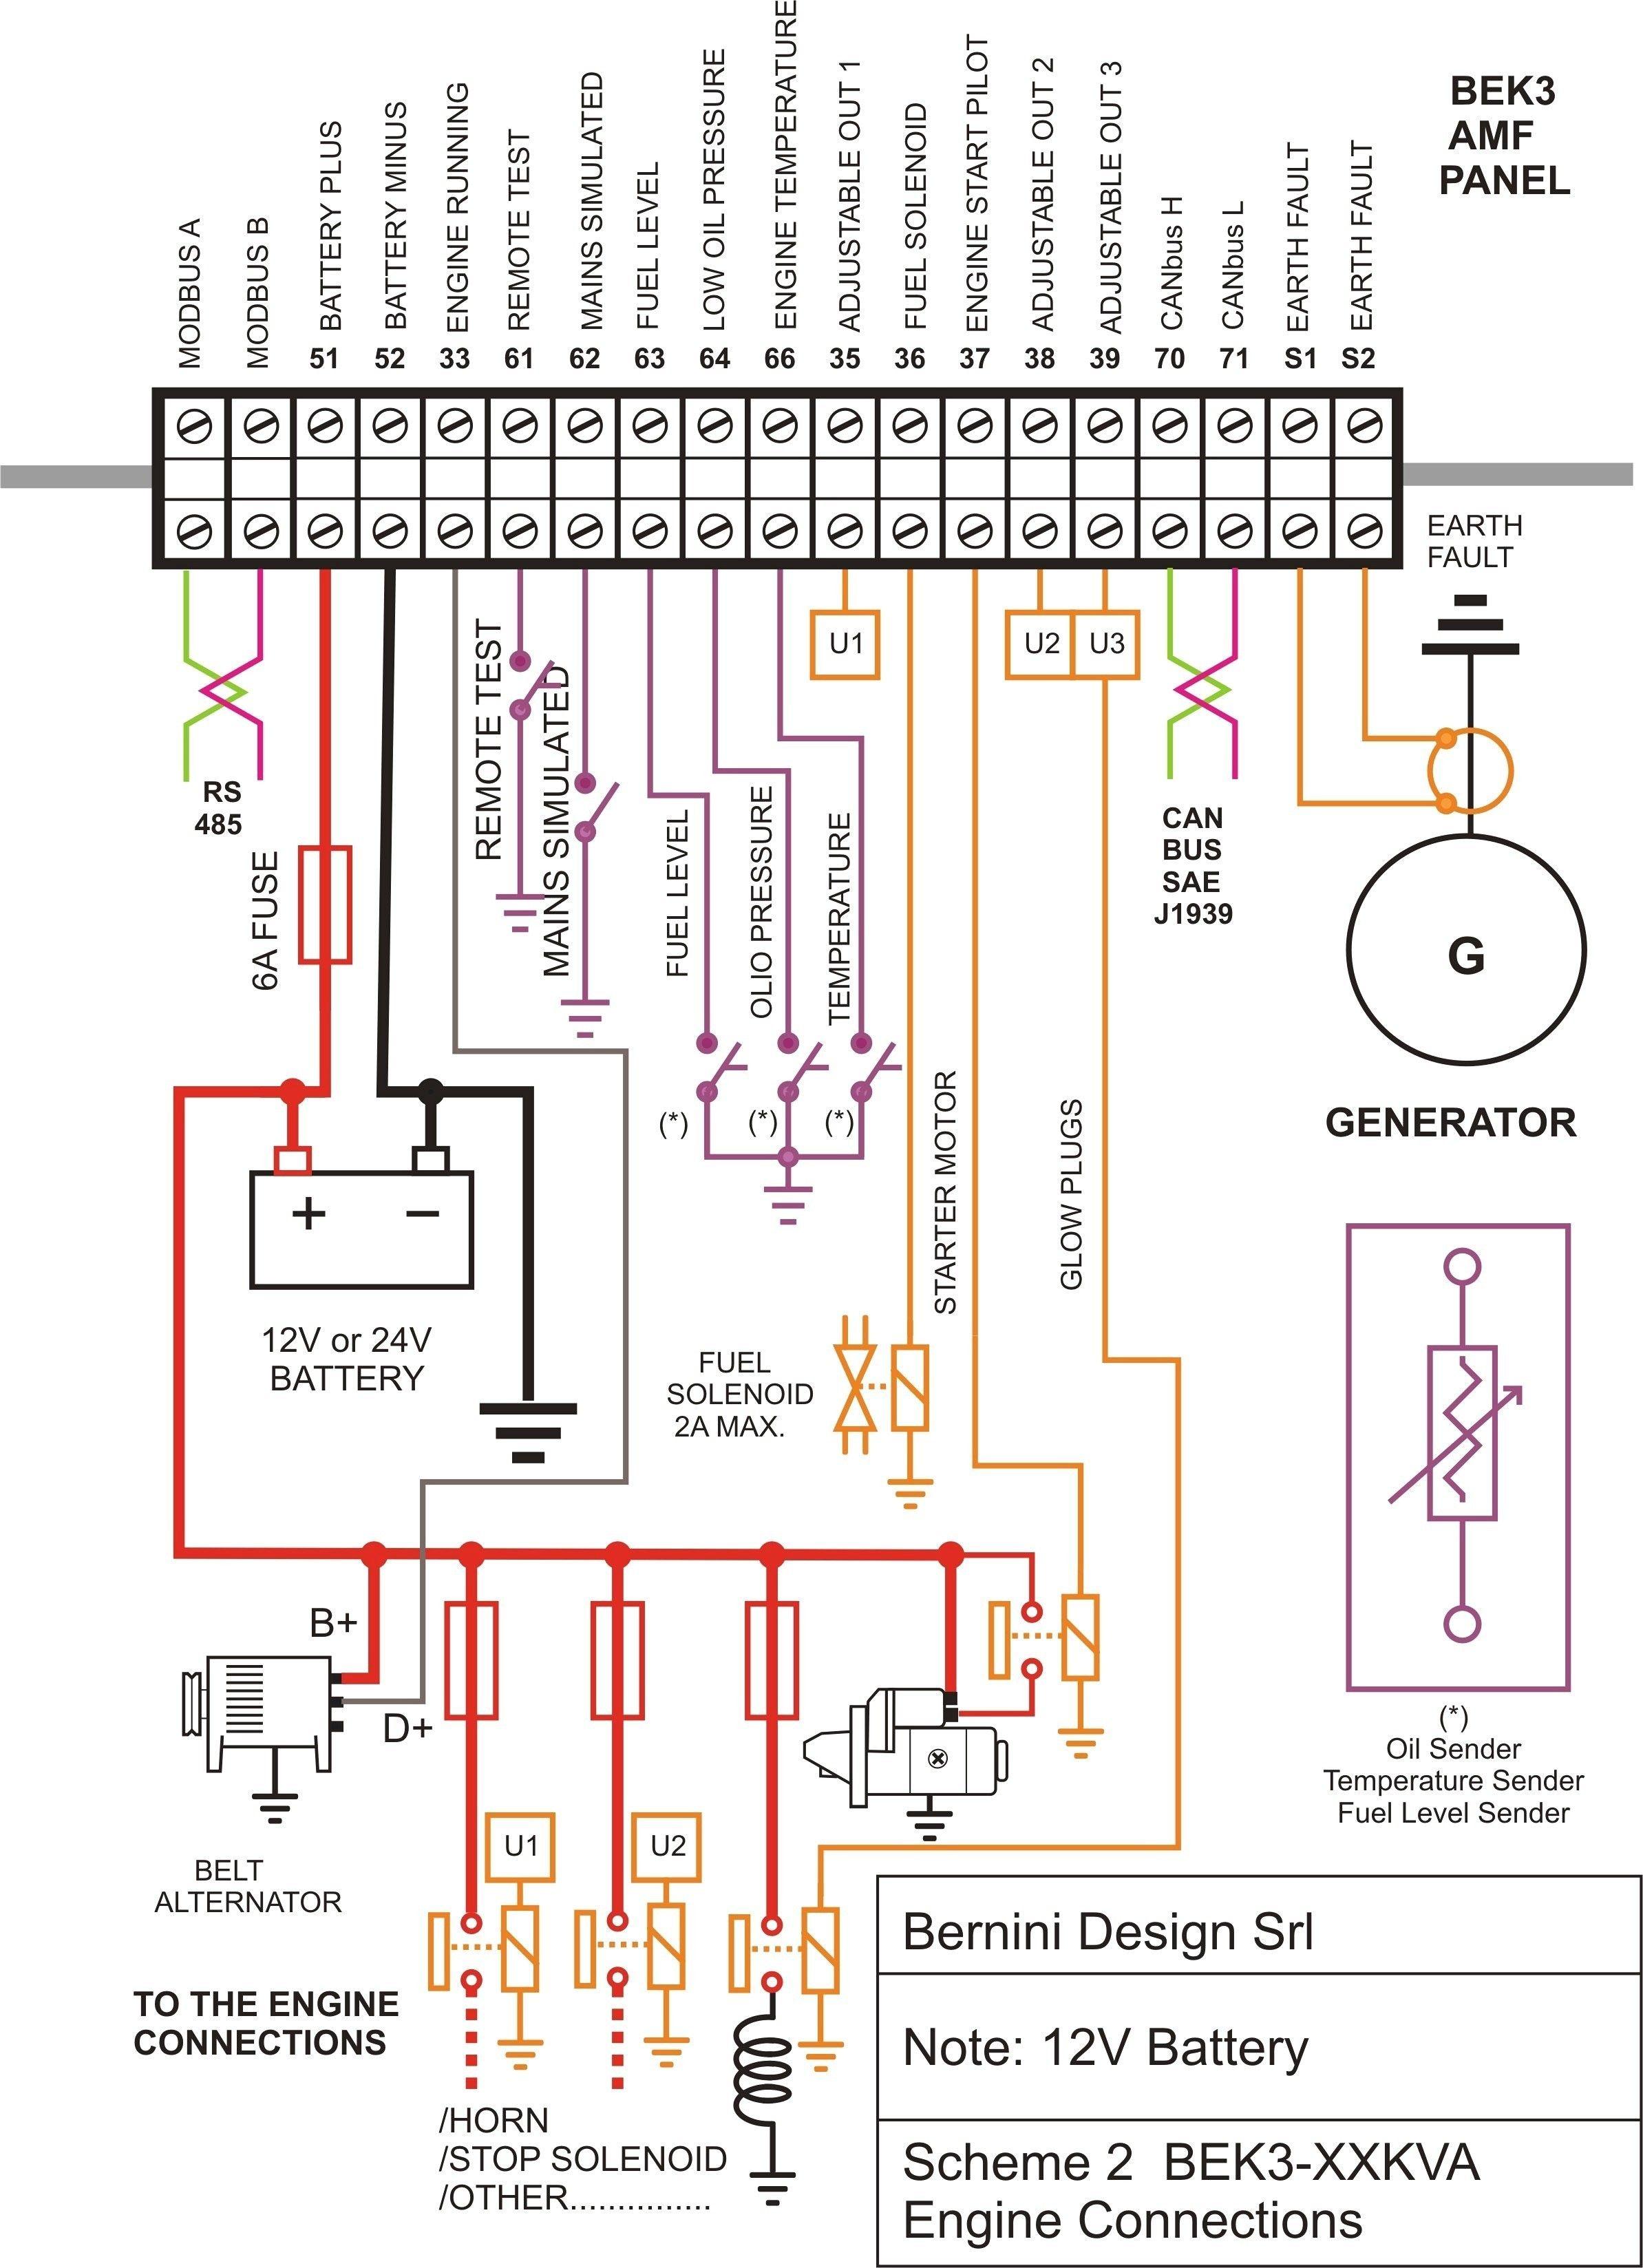 New Circuit Diagram Sample Open Source Diagram Diagramtemplate Diagramsample Cablage Electrique Schema Electrique Shema Electrique